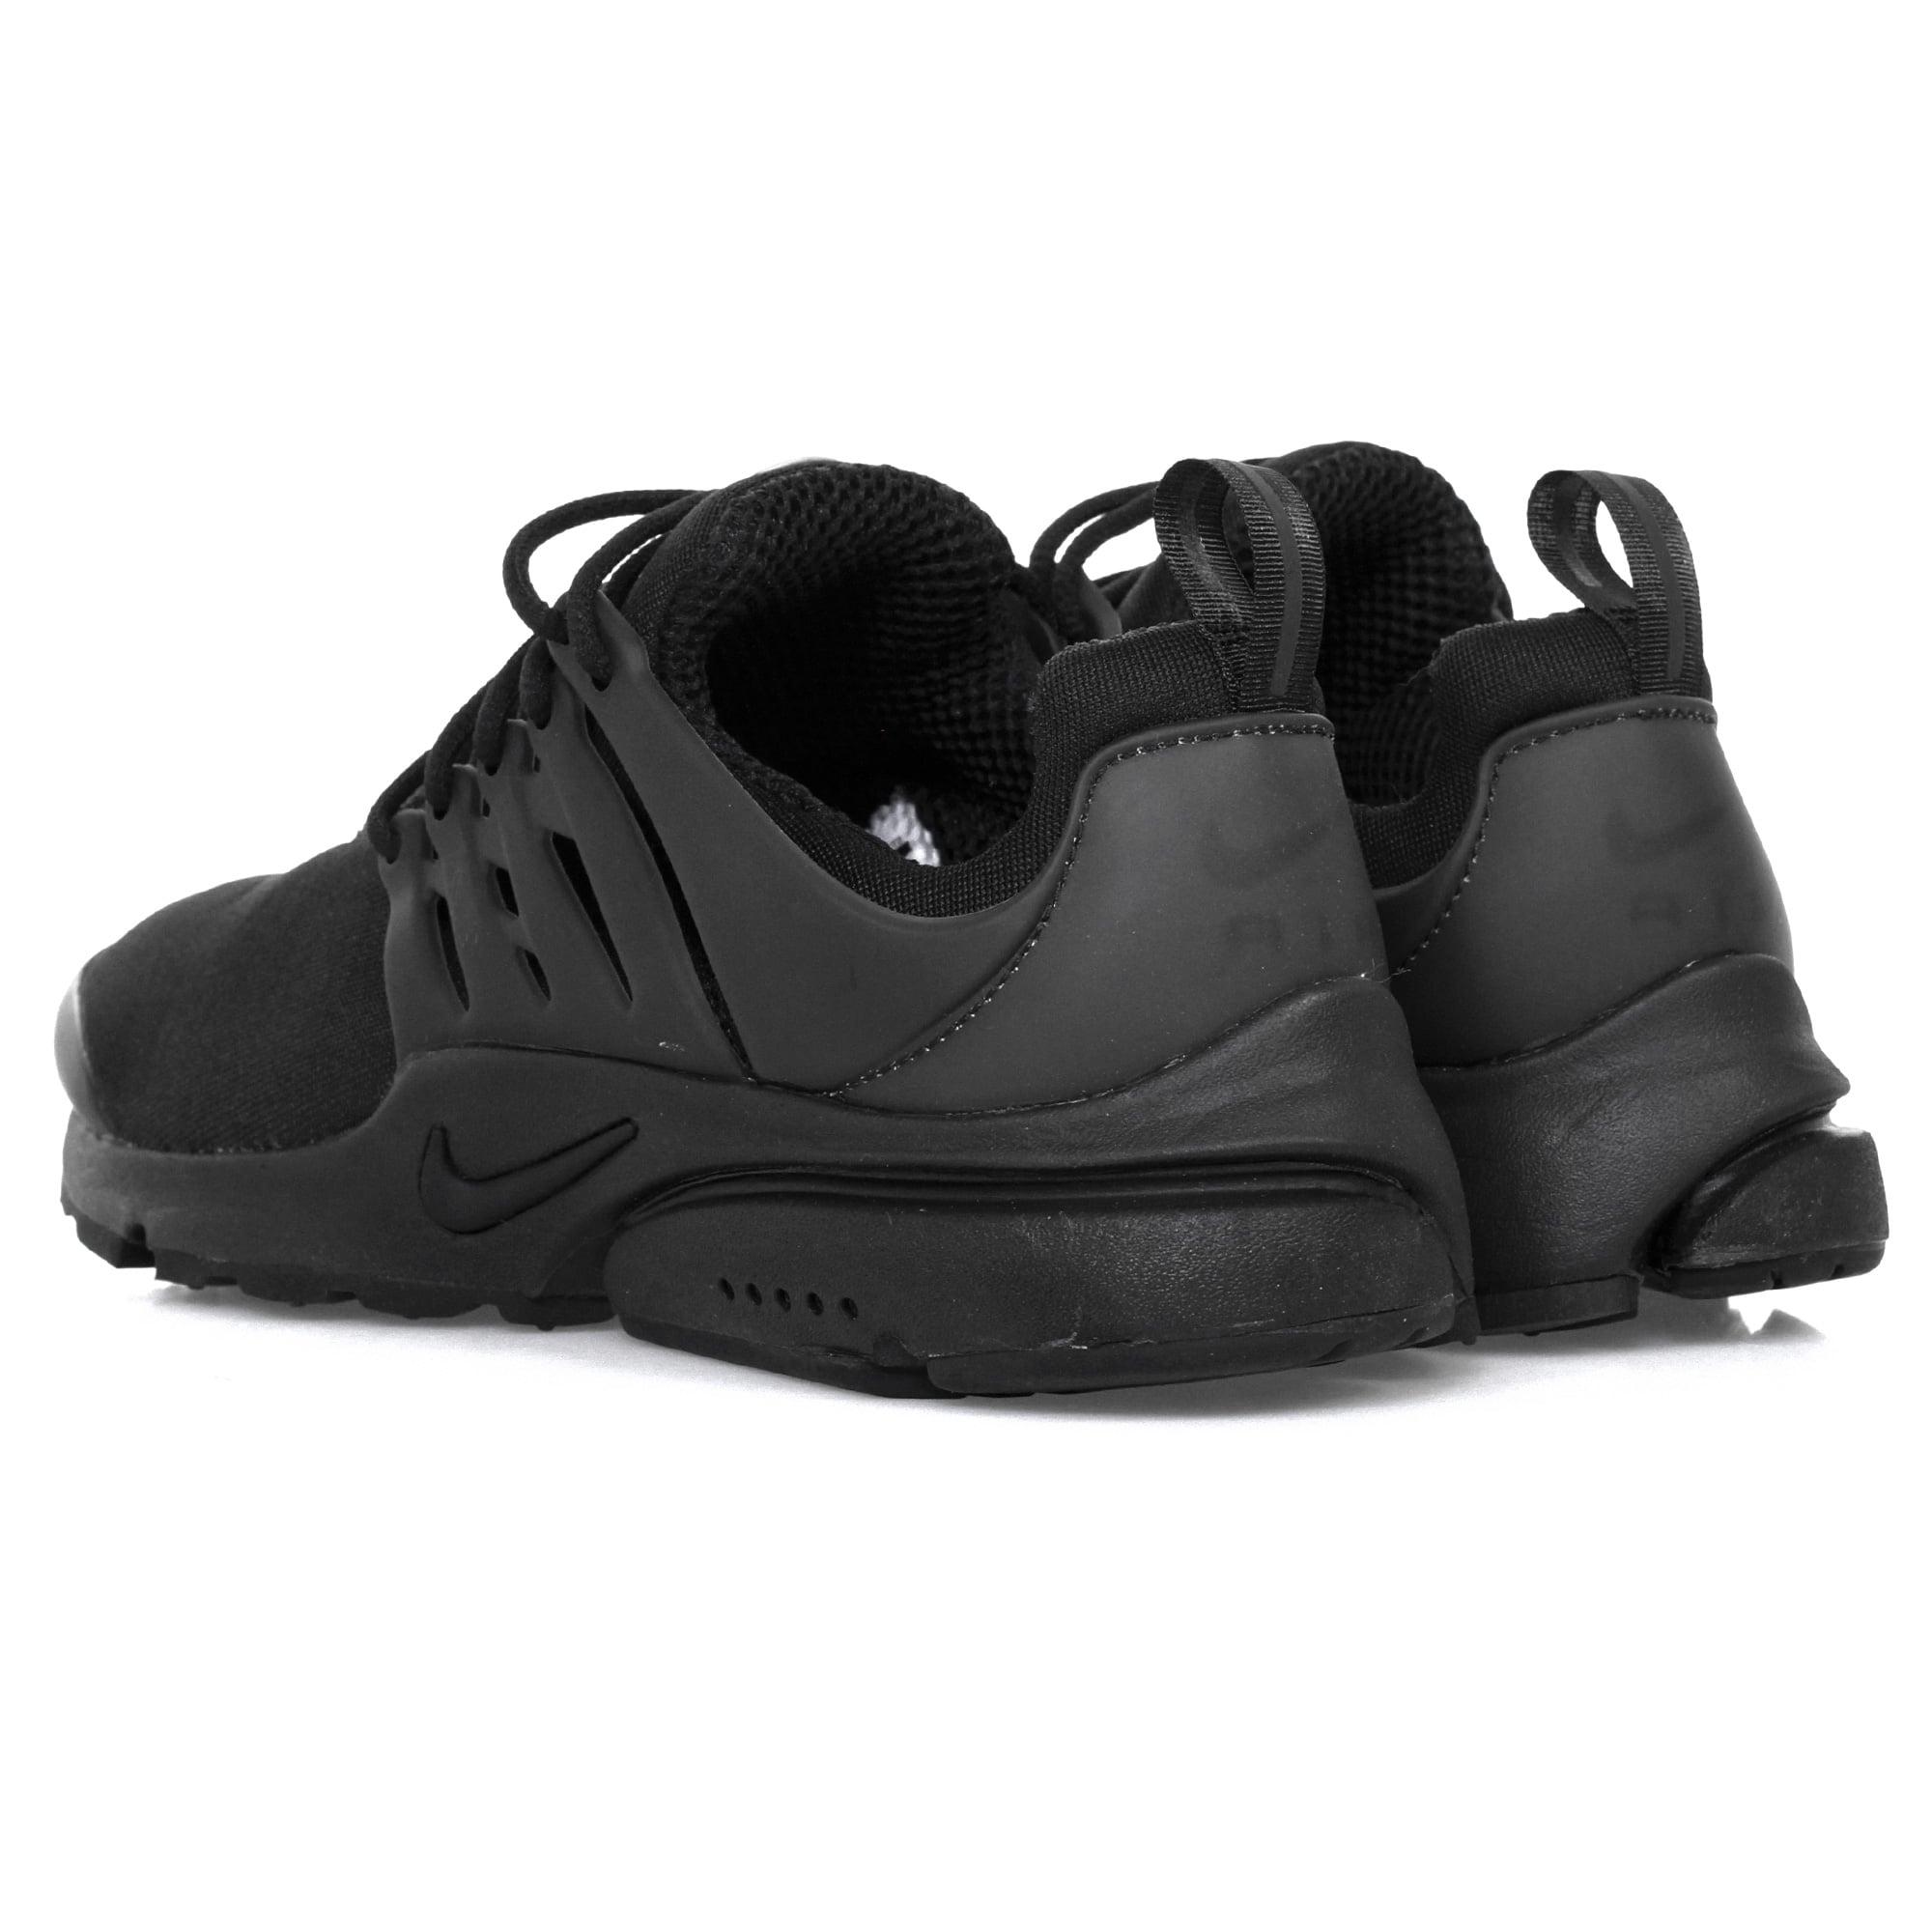 nike air presto essential sneakers black shoe. Black Bedroom Furniture Sets. Home Design Ideas